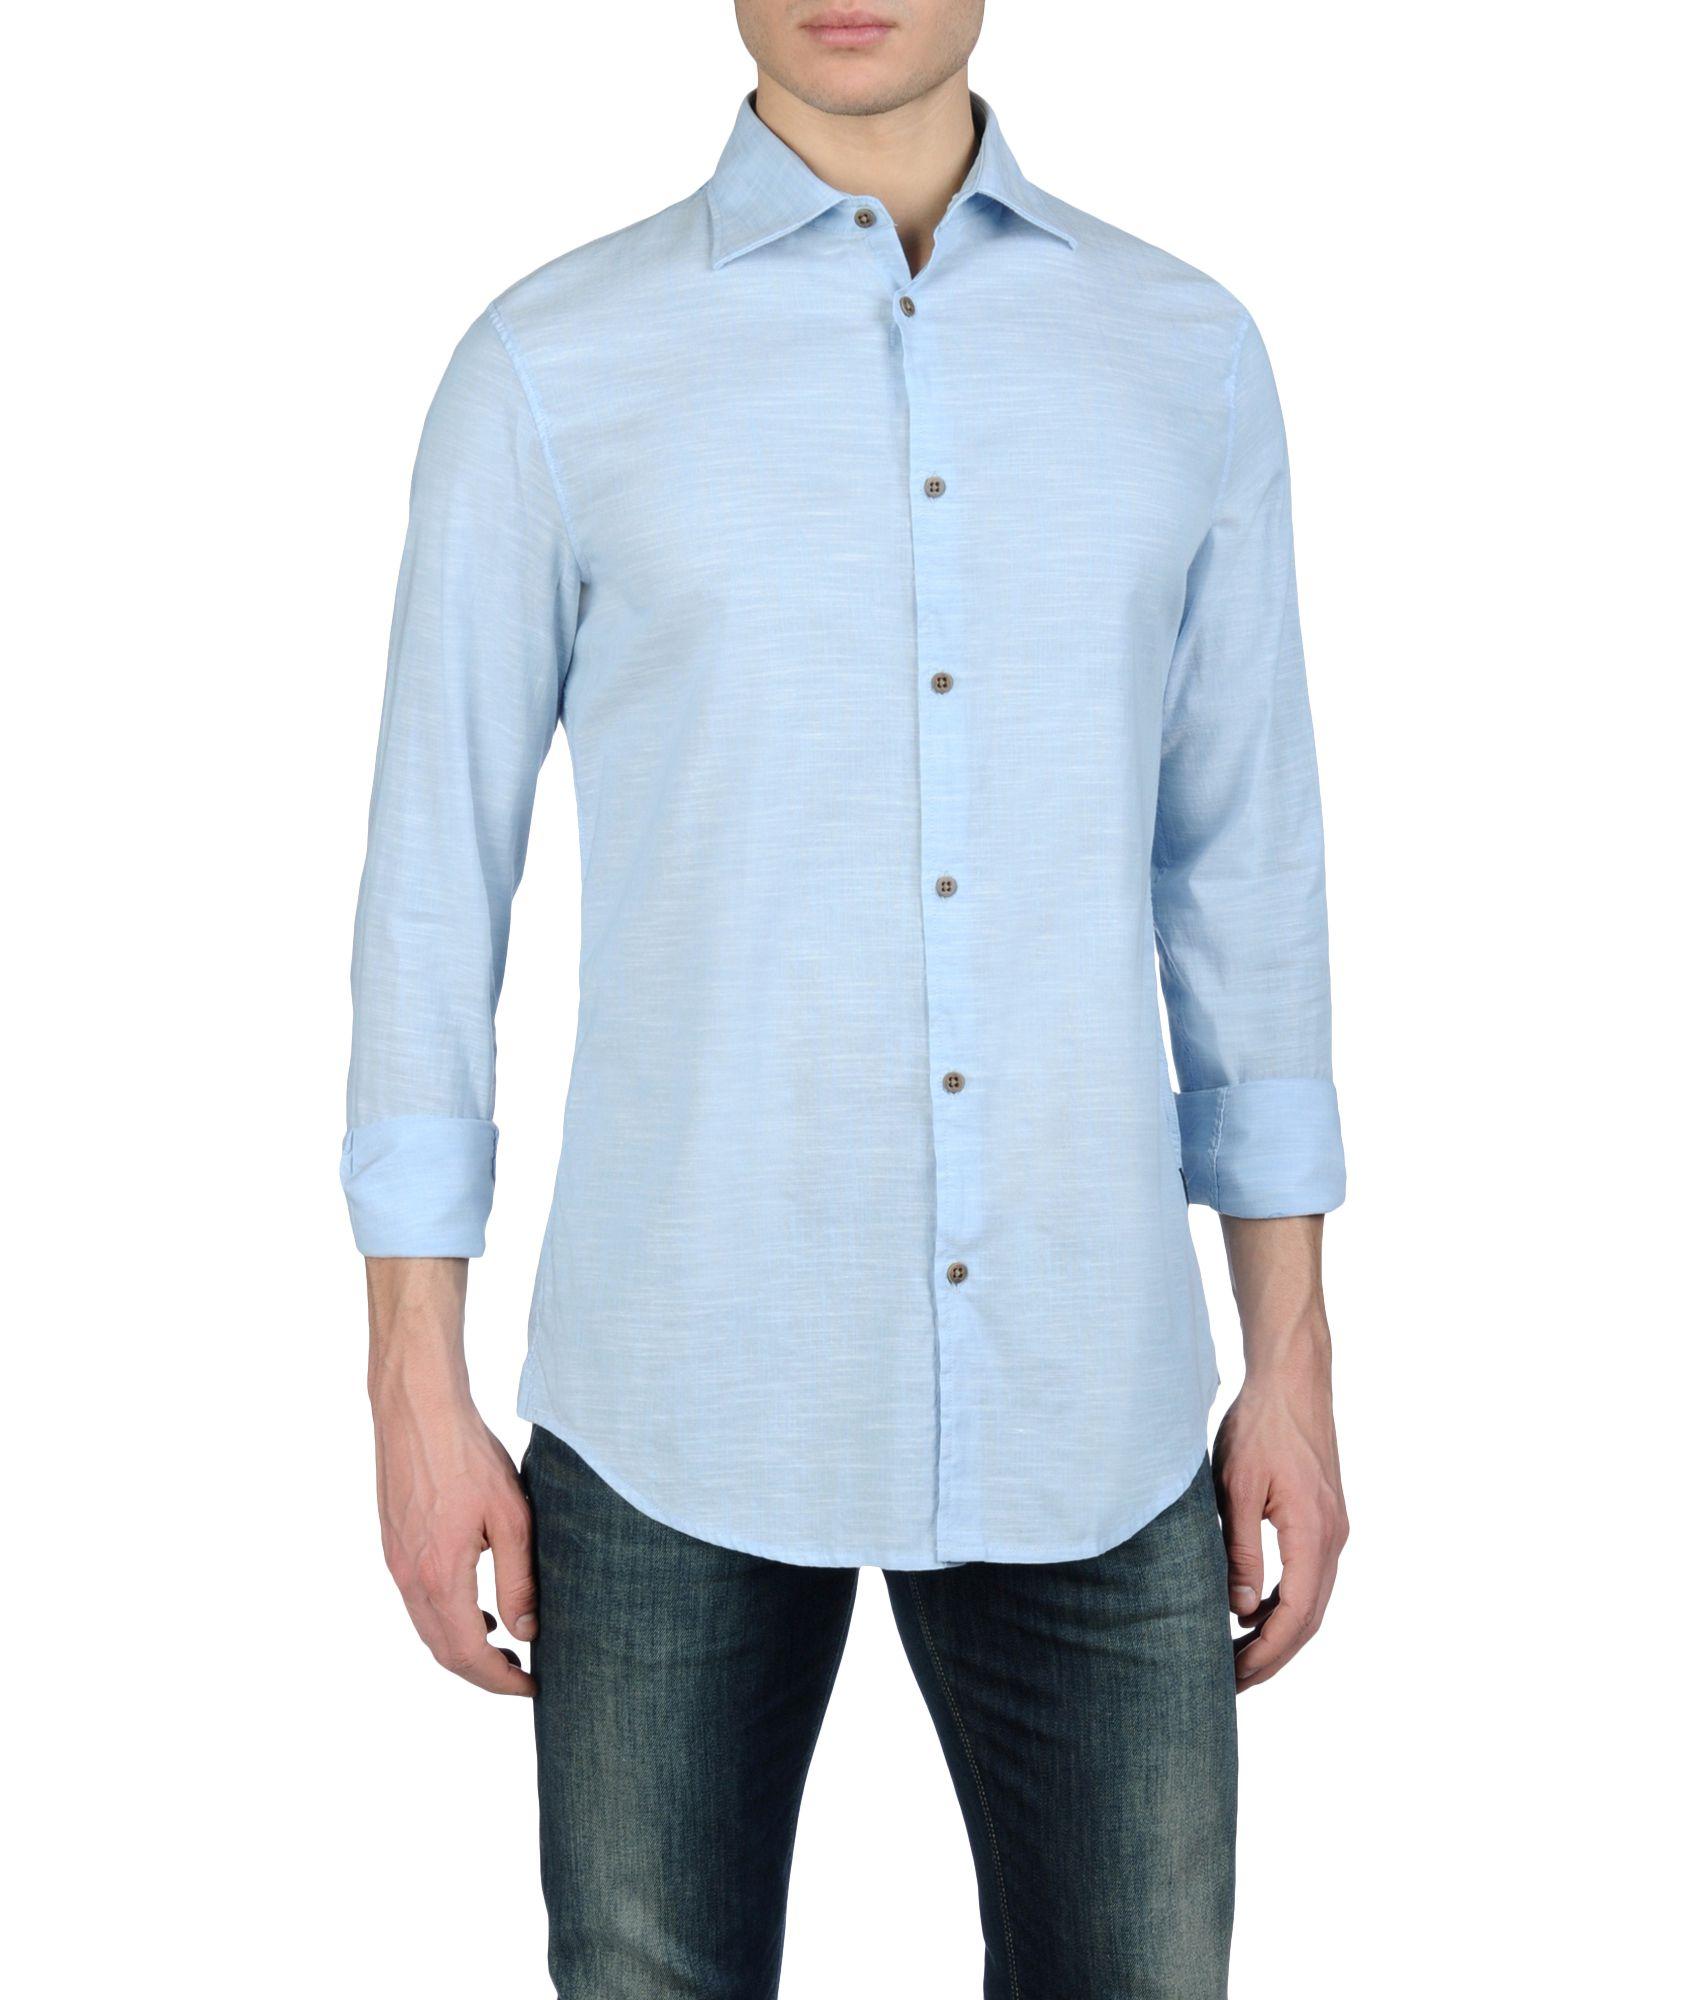 b44dfe50ad Armani Jeans Casual Shirts - BCD Tofu House